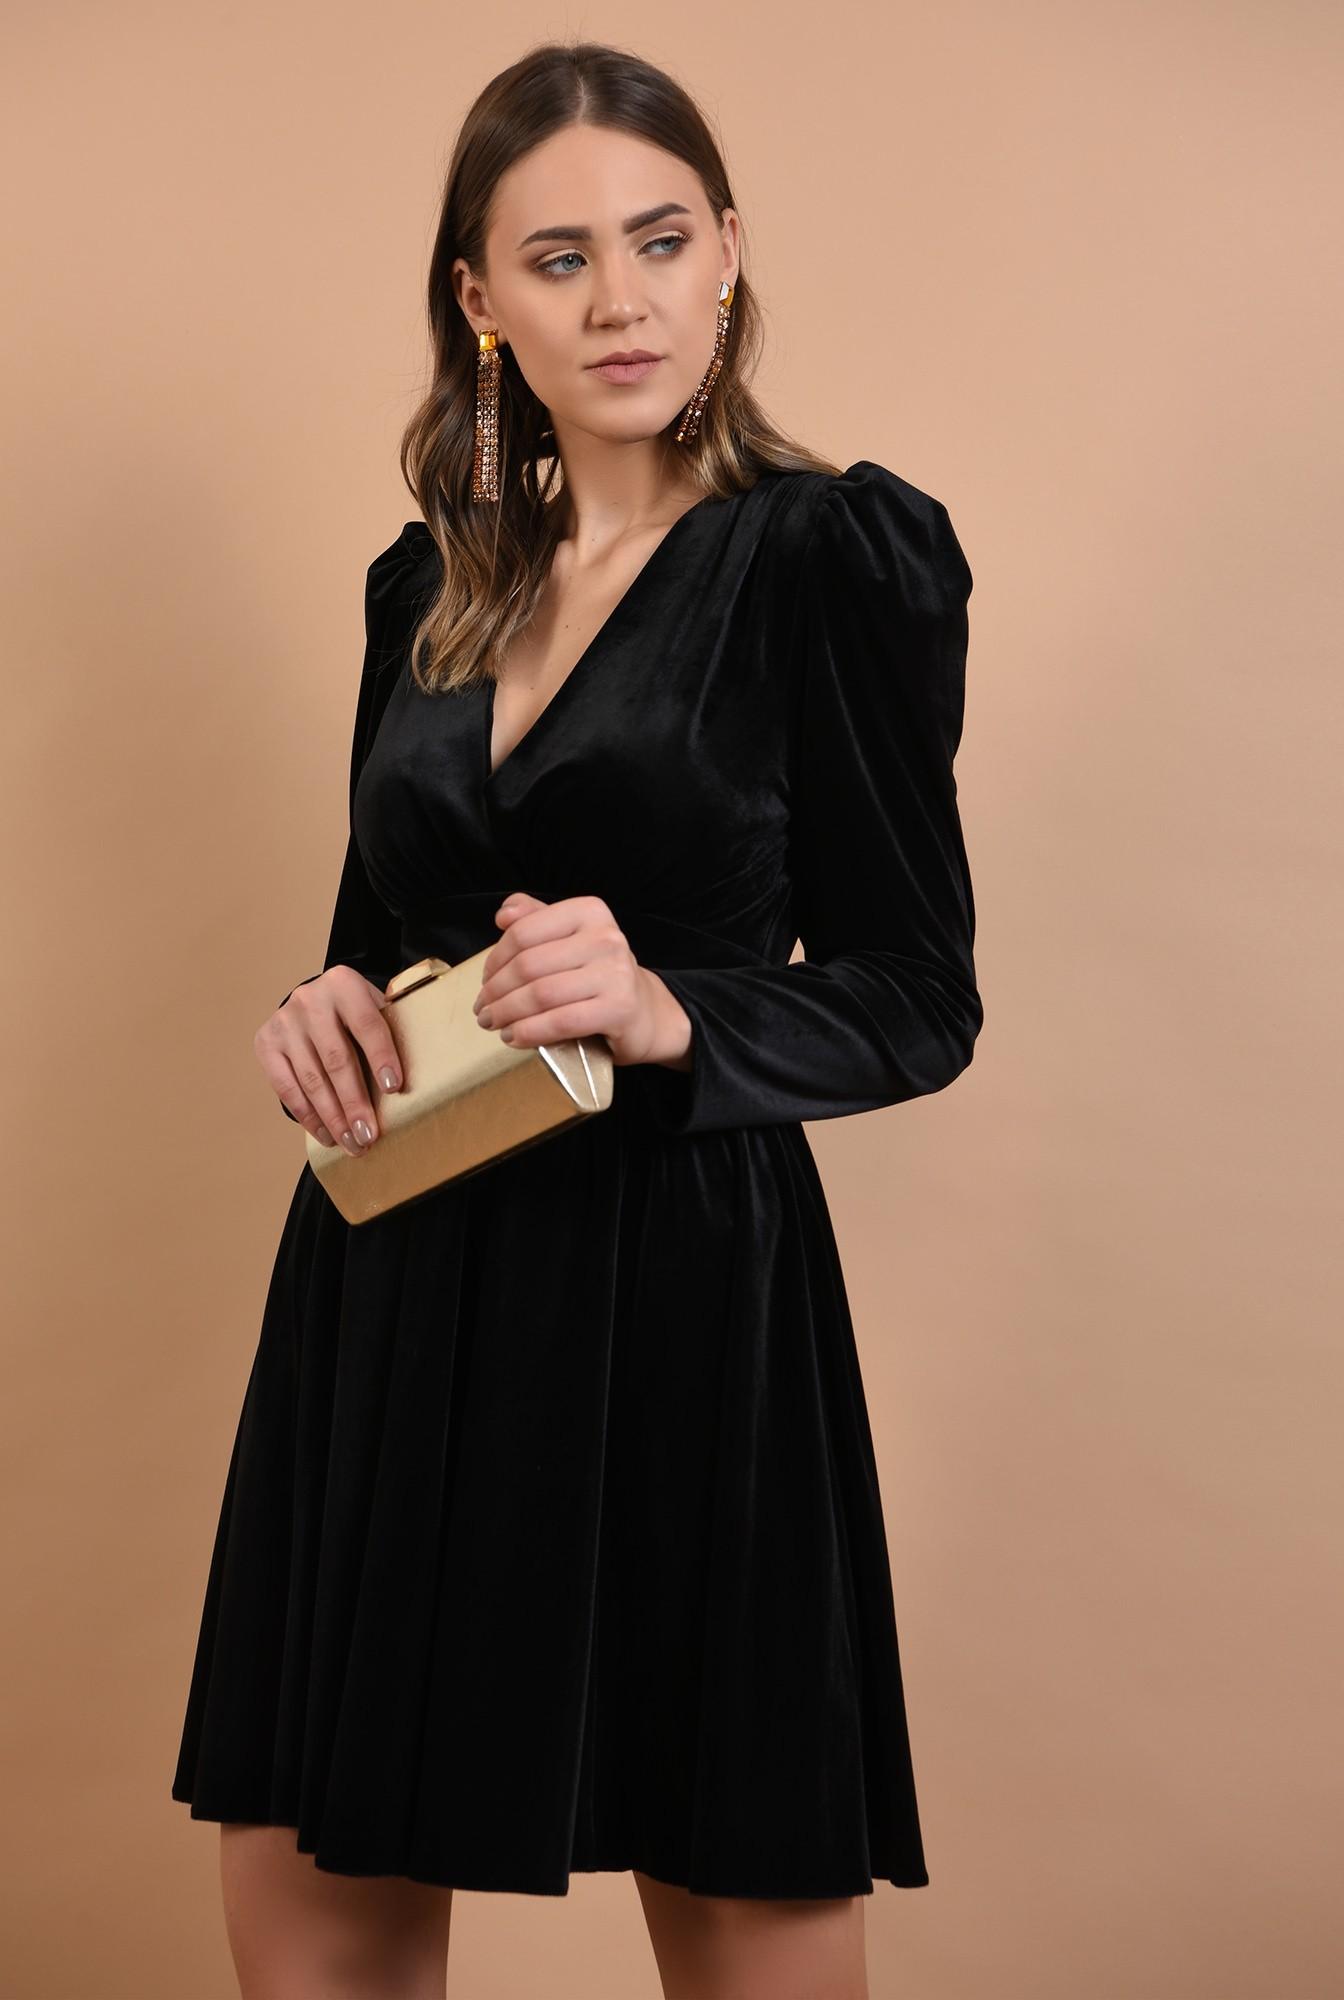 2 - rochie eleganta, din catifea, neagra, scurta